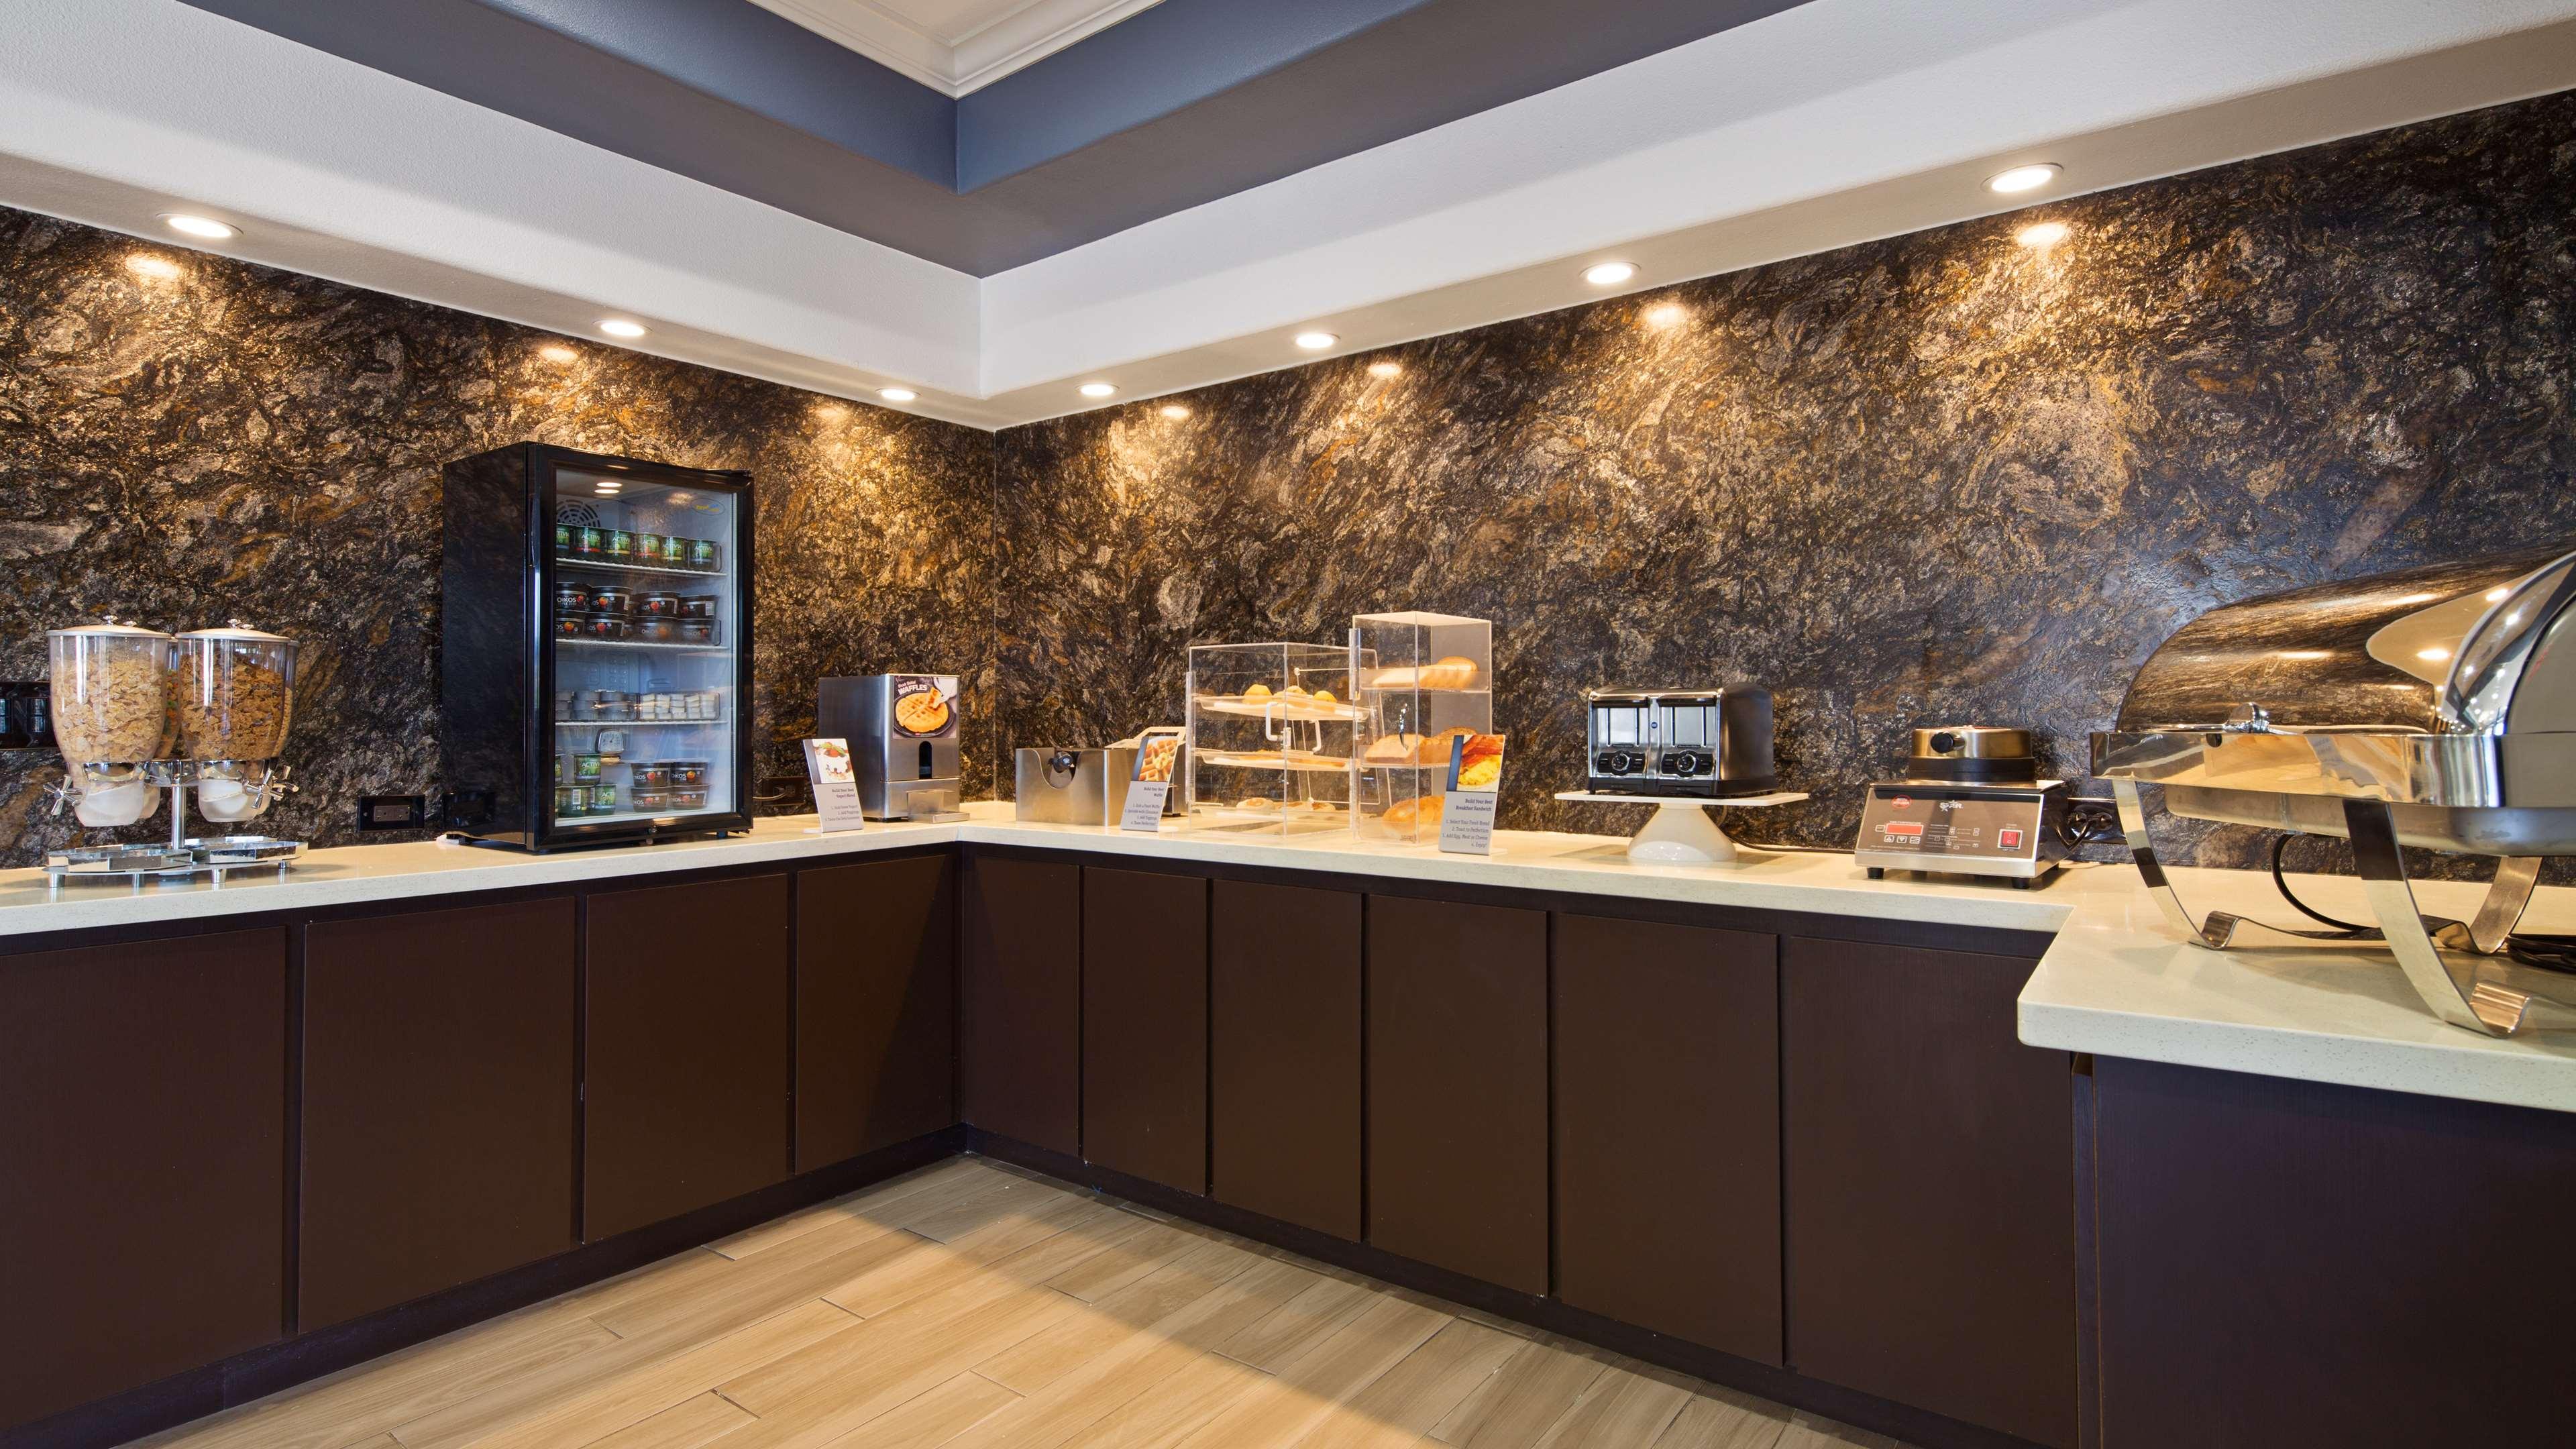 Best Western Plus North Houston Inn & Suites image 5